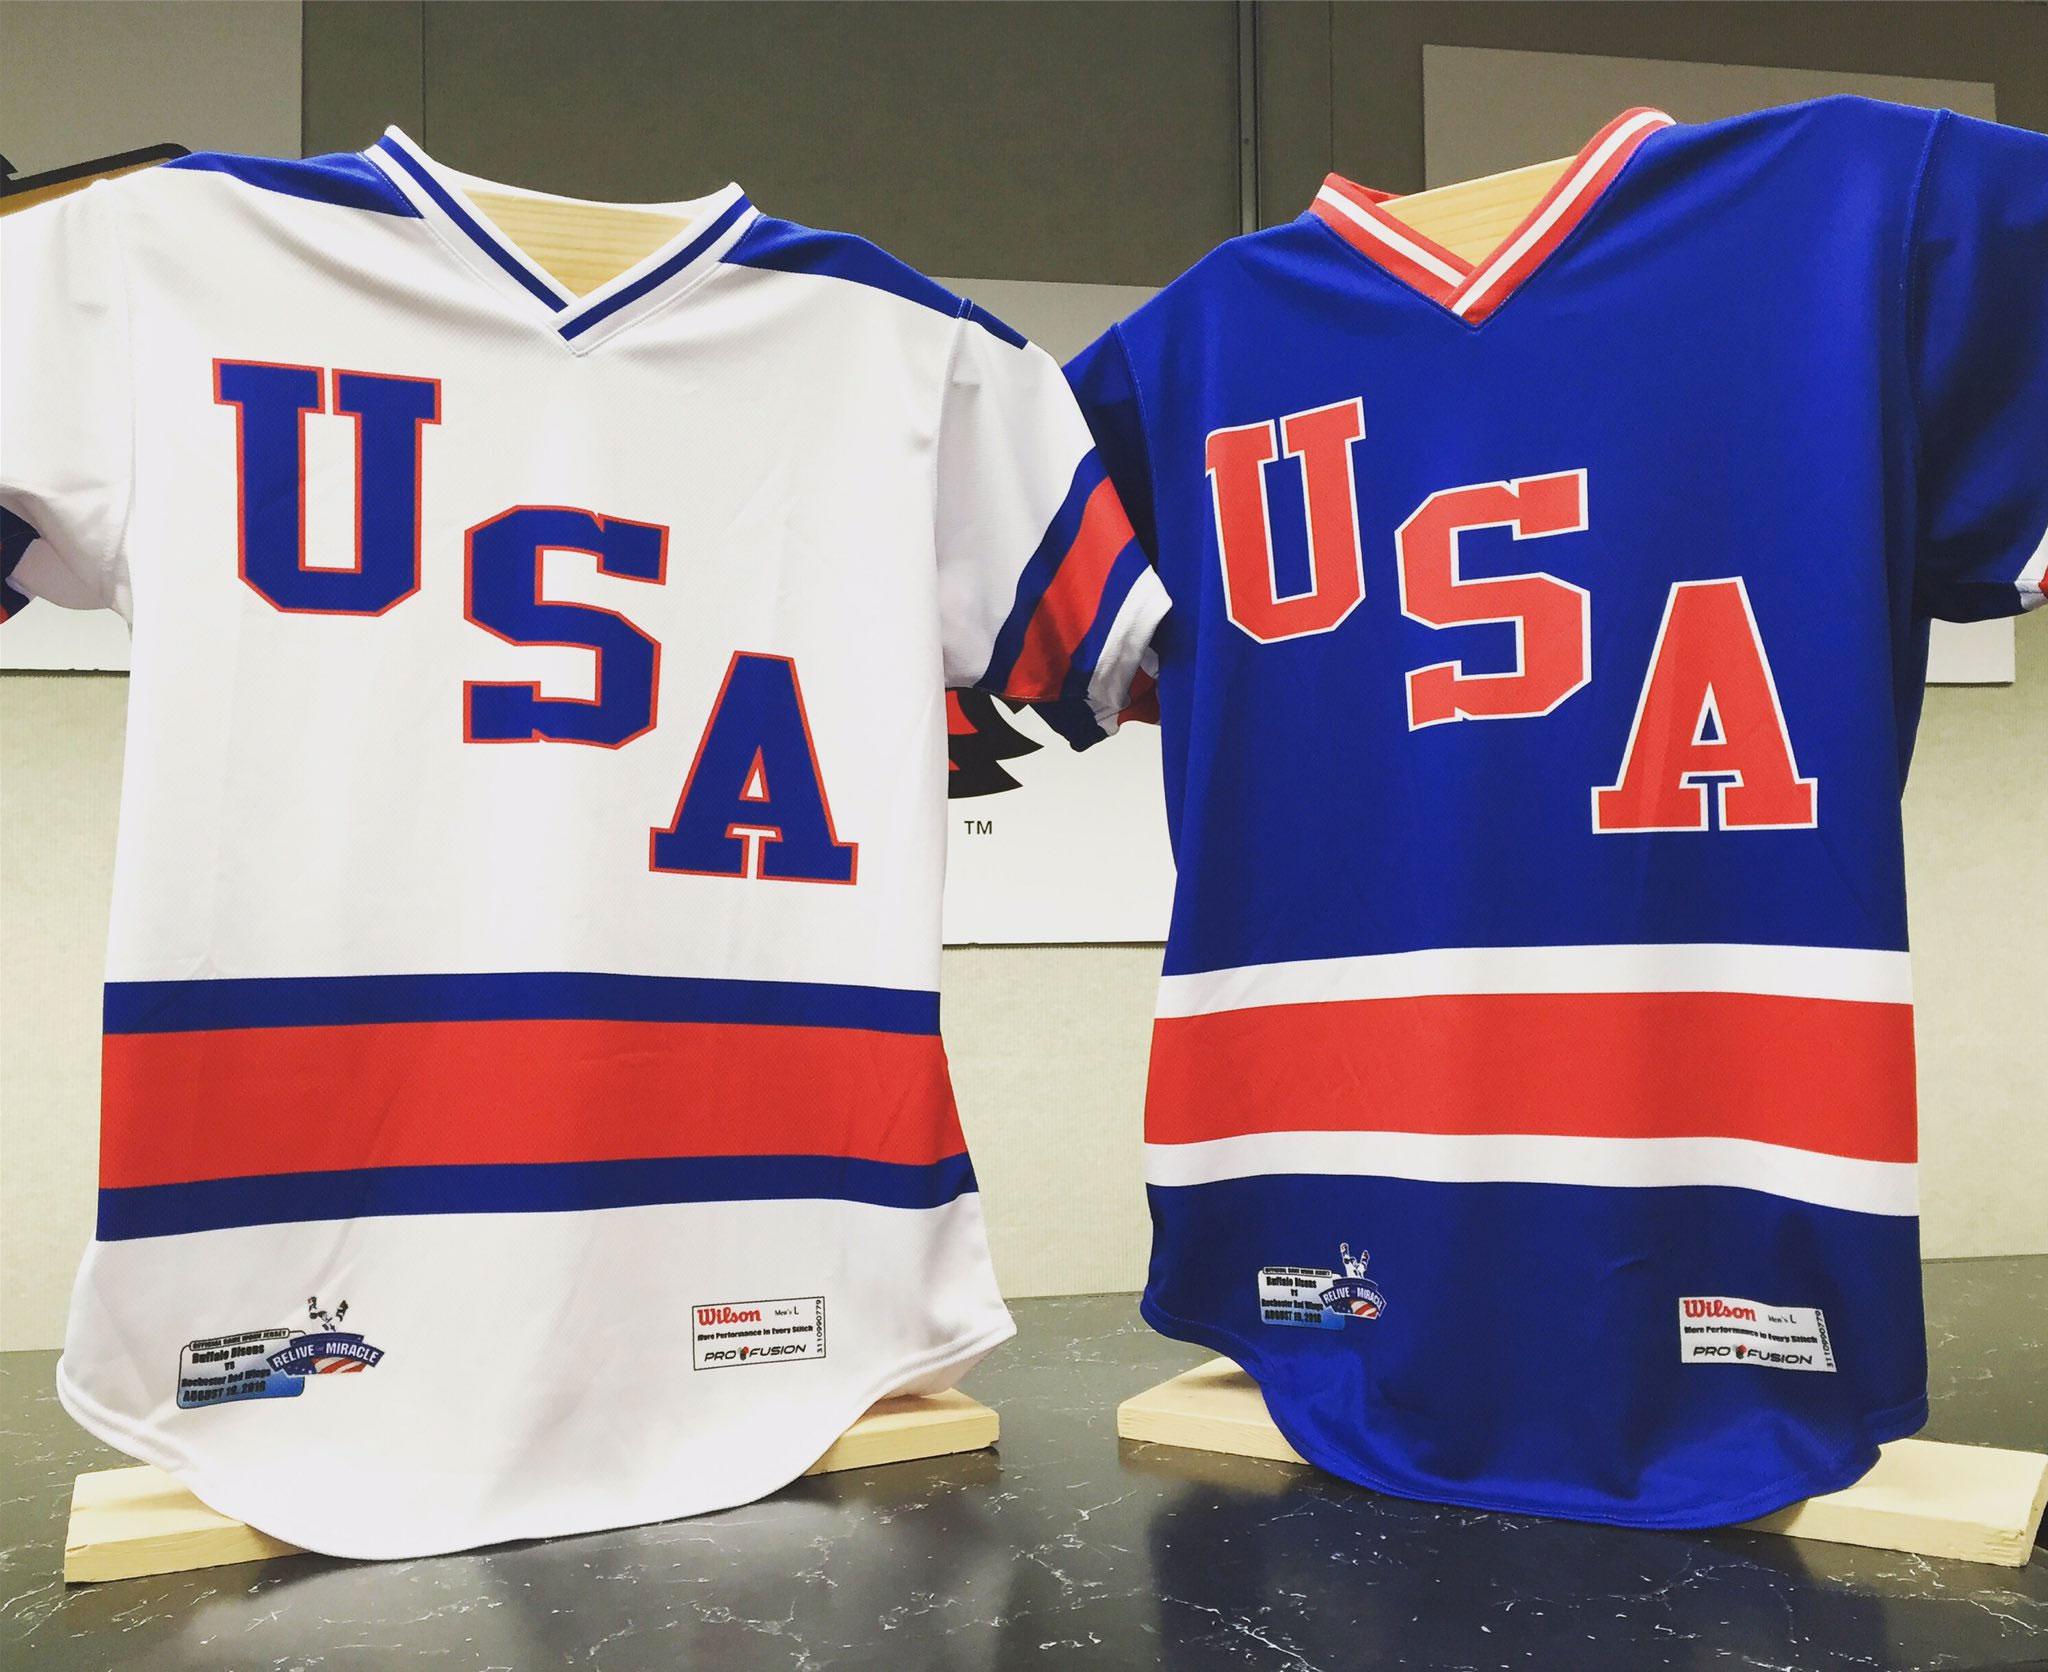 USA! USA! Baseball Team Wears Miracle on Ice Jerseys